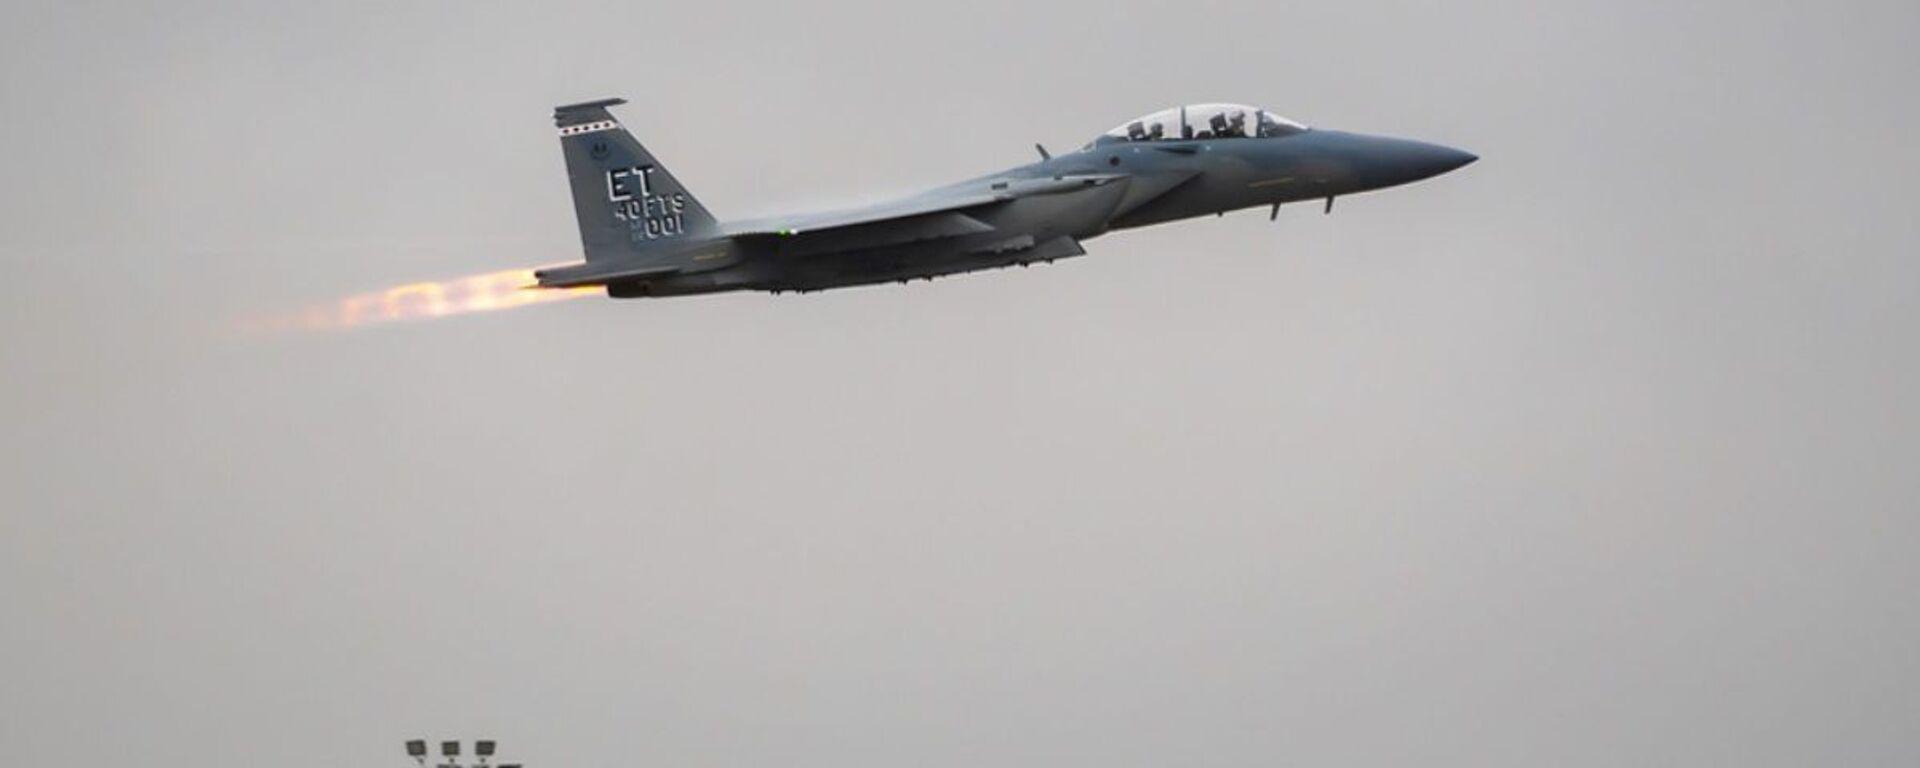 F-15EX Advanced Eagle - Sputnik Polska, 1920, 11.04.2021